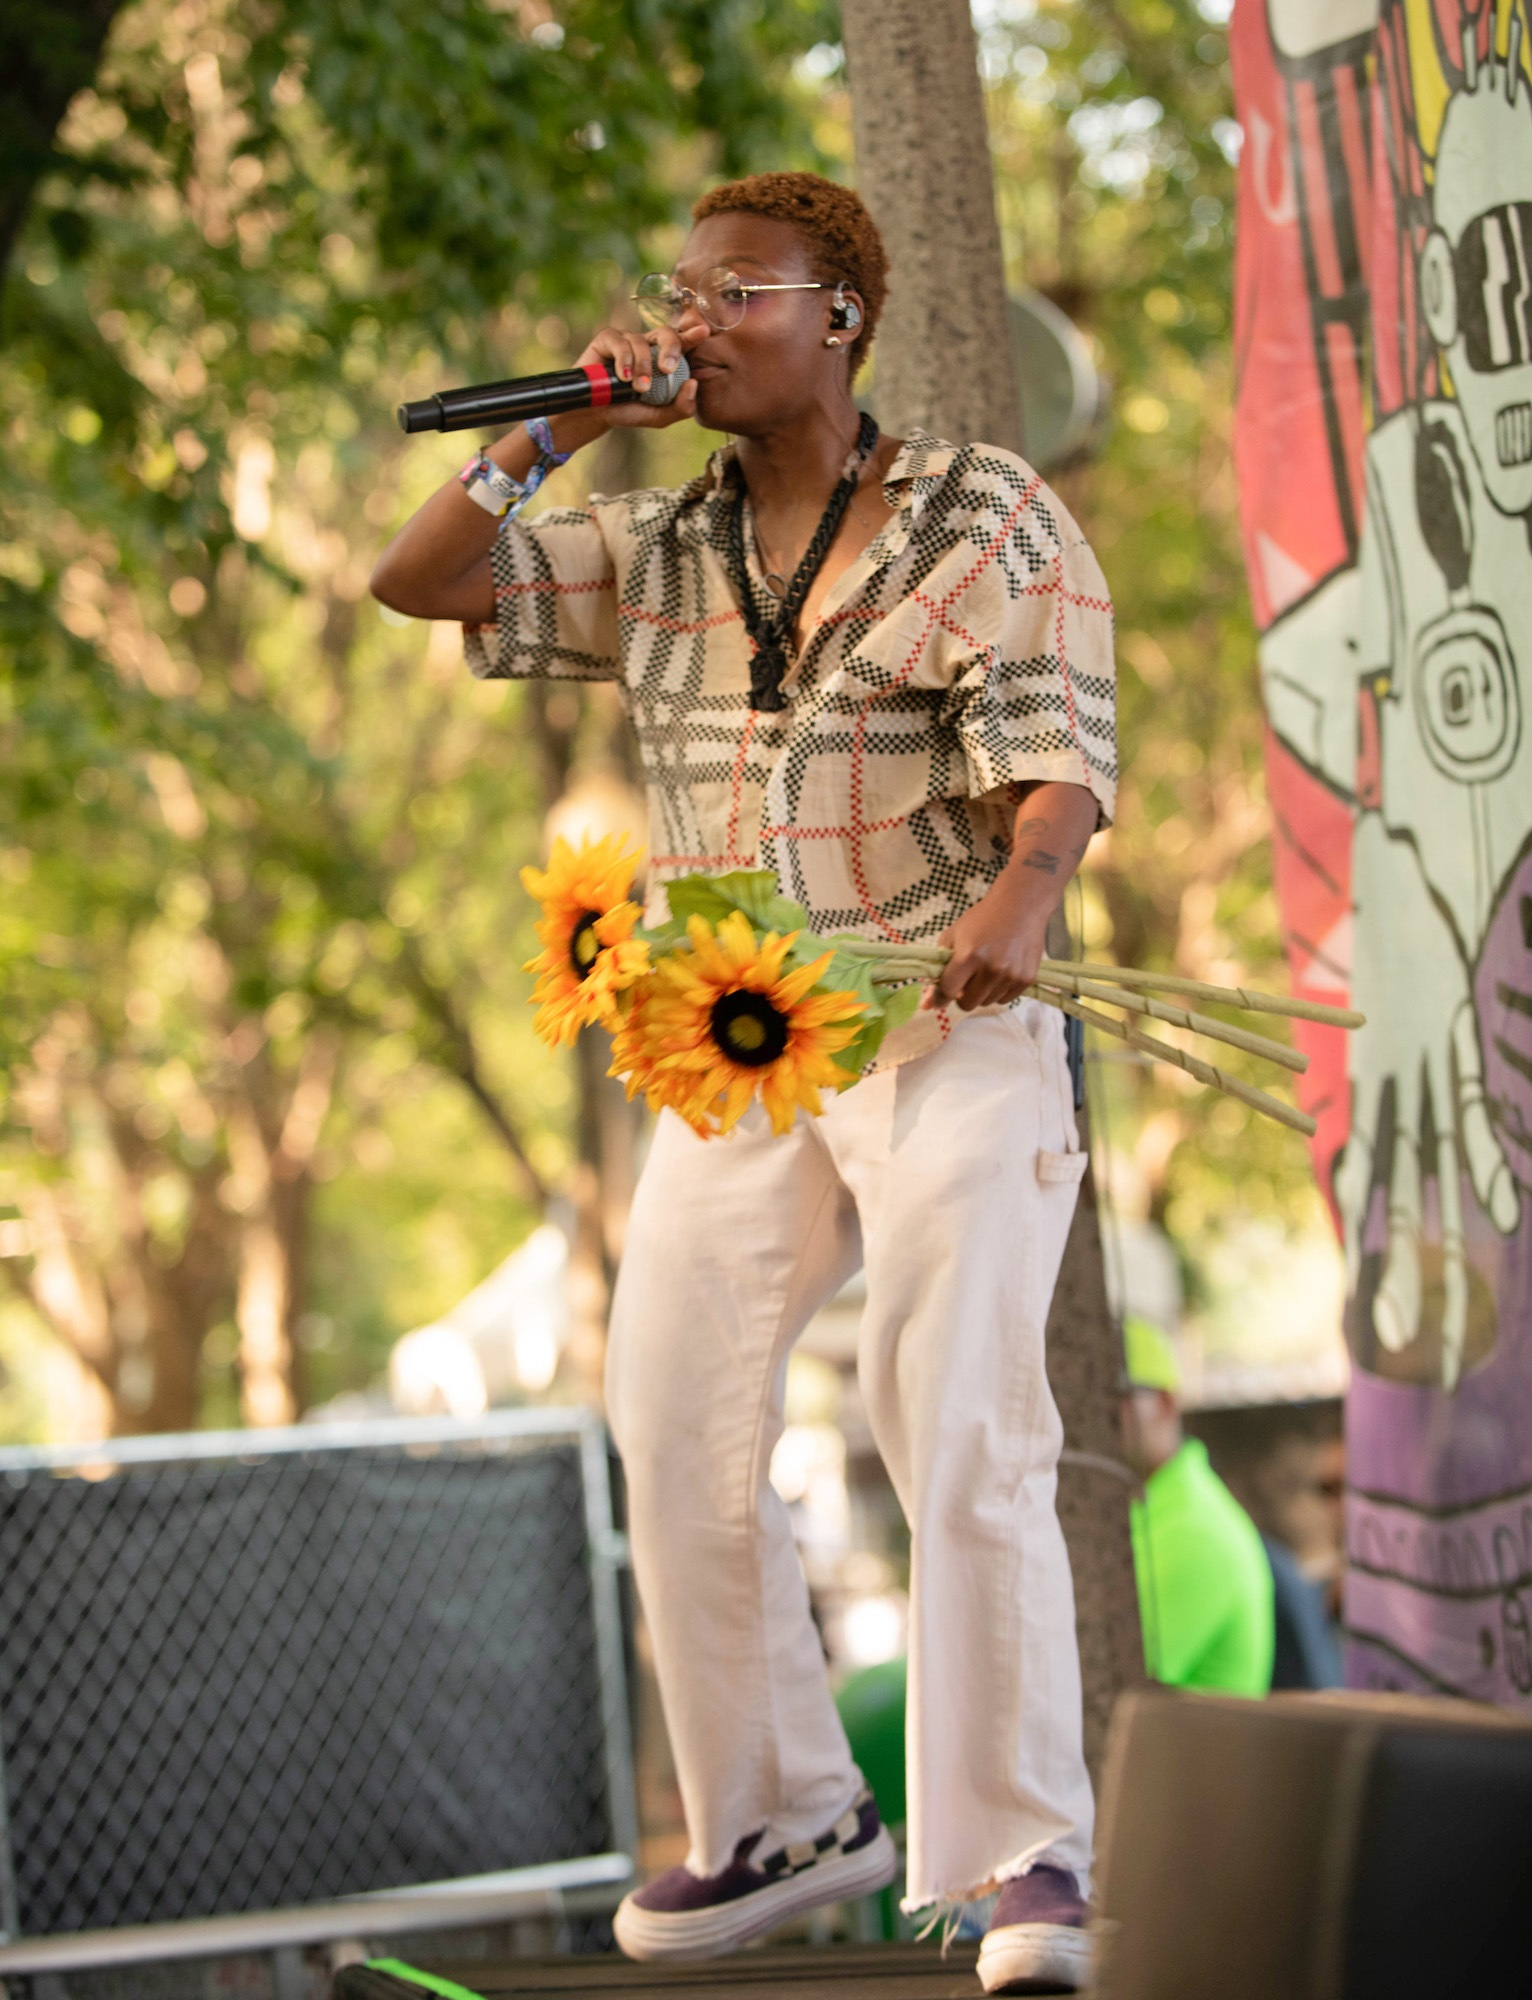 Serena Isioma Live at Lollapalooza [GALLERY] 3